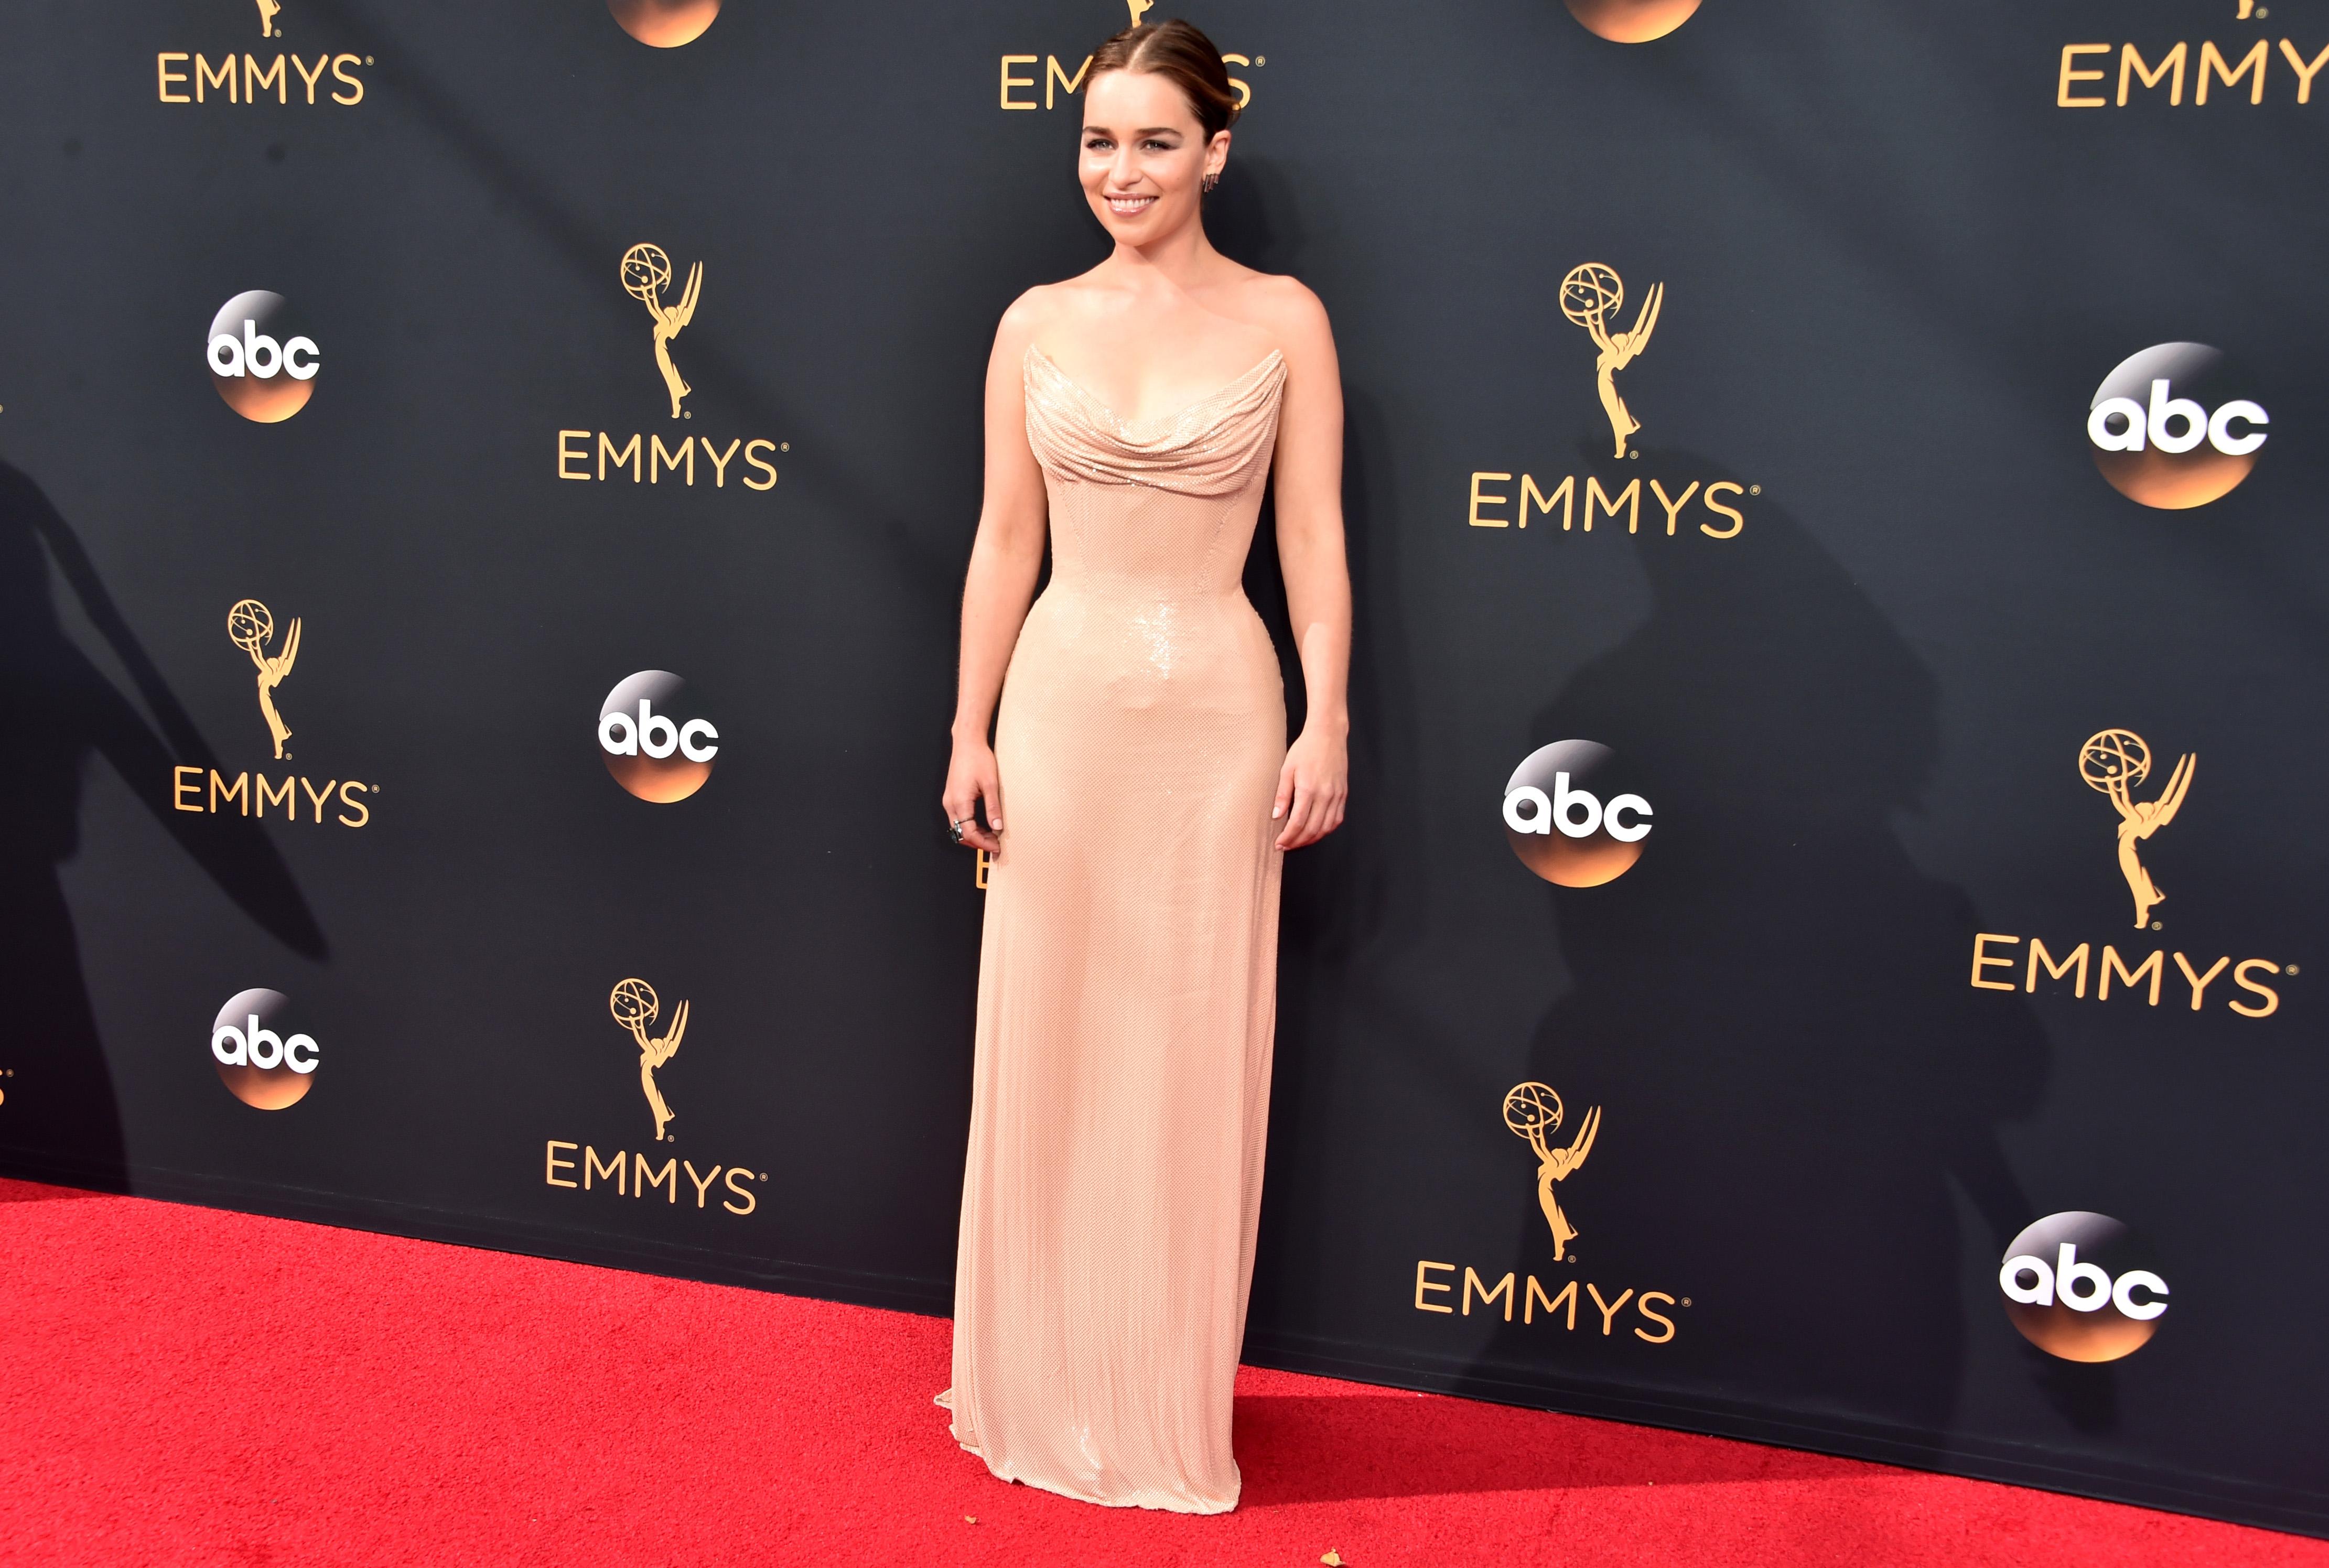 Alfombra roja Emmy Awards 2016